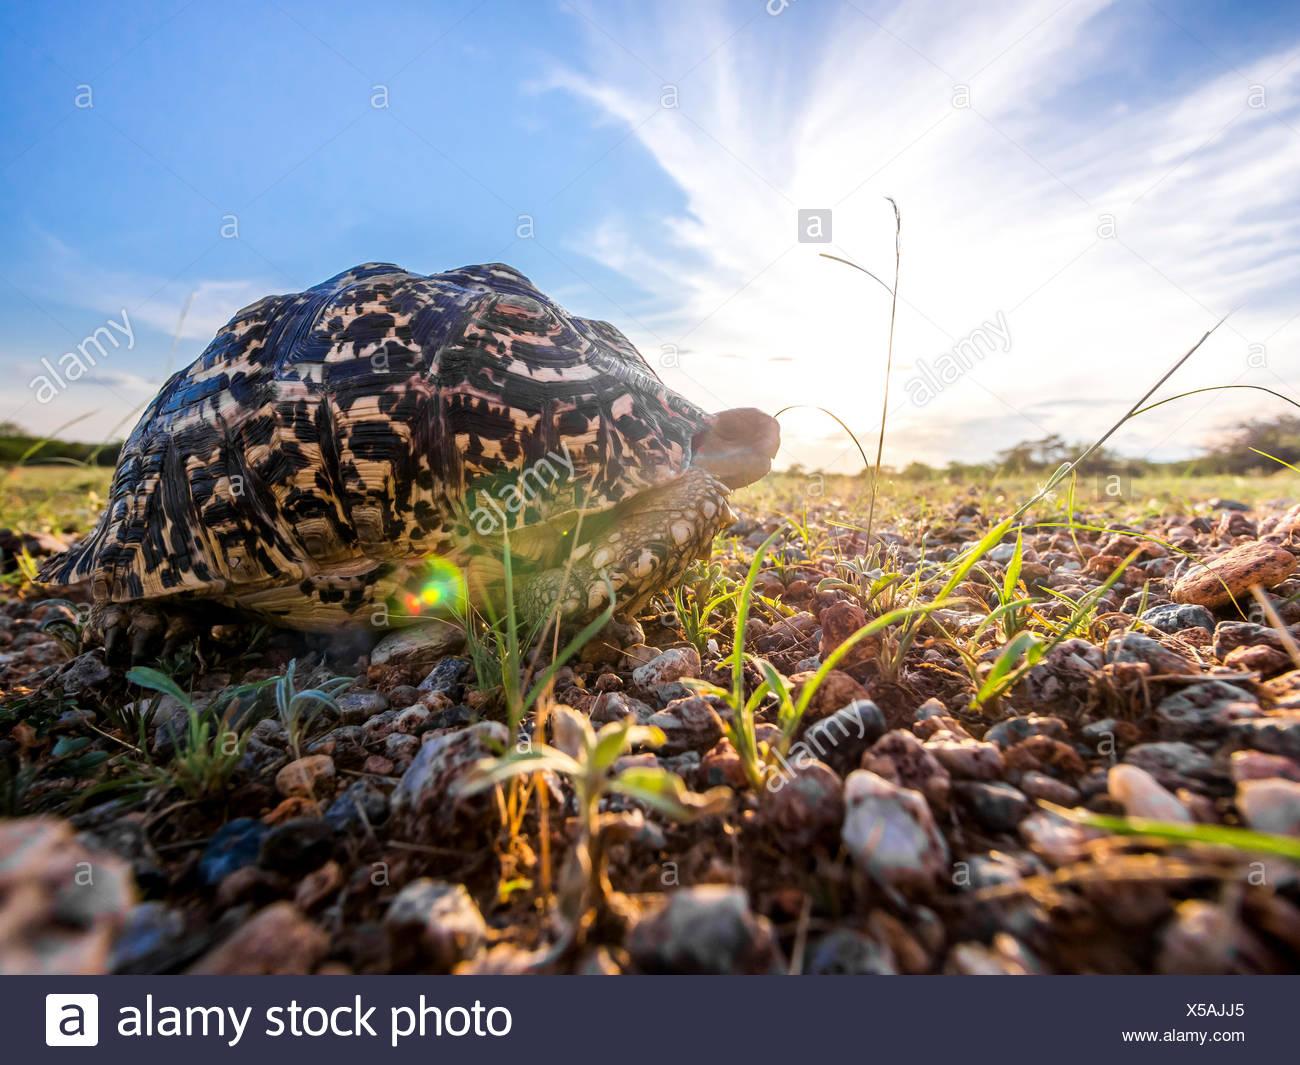 Namibia, Outjo, Ongava Wild Reservat, leopard tortoise at backlight - Stock Image